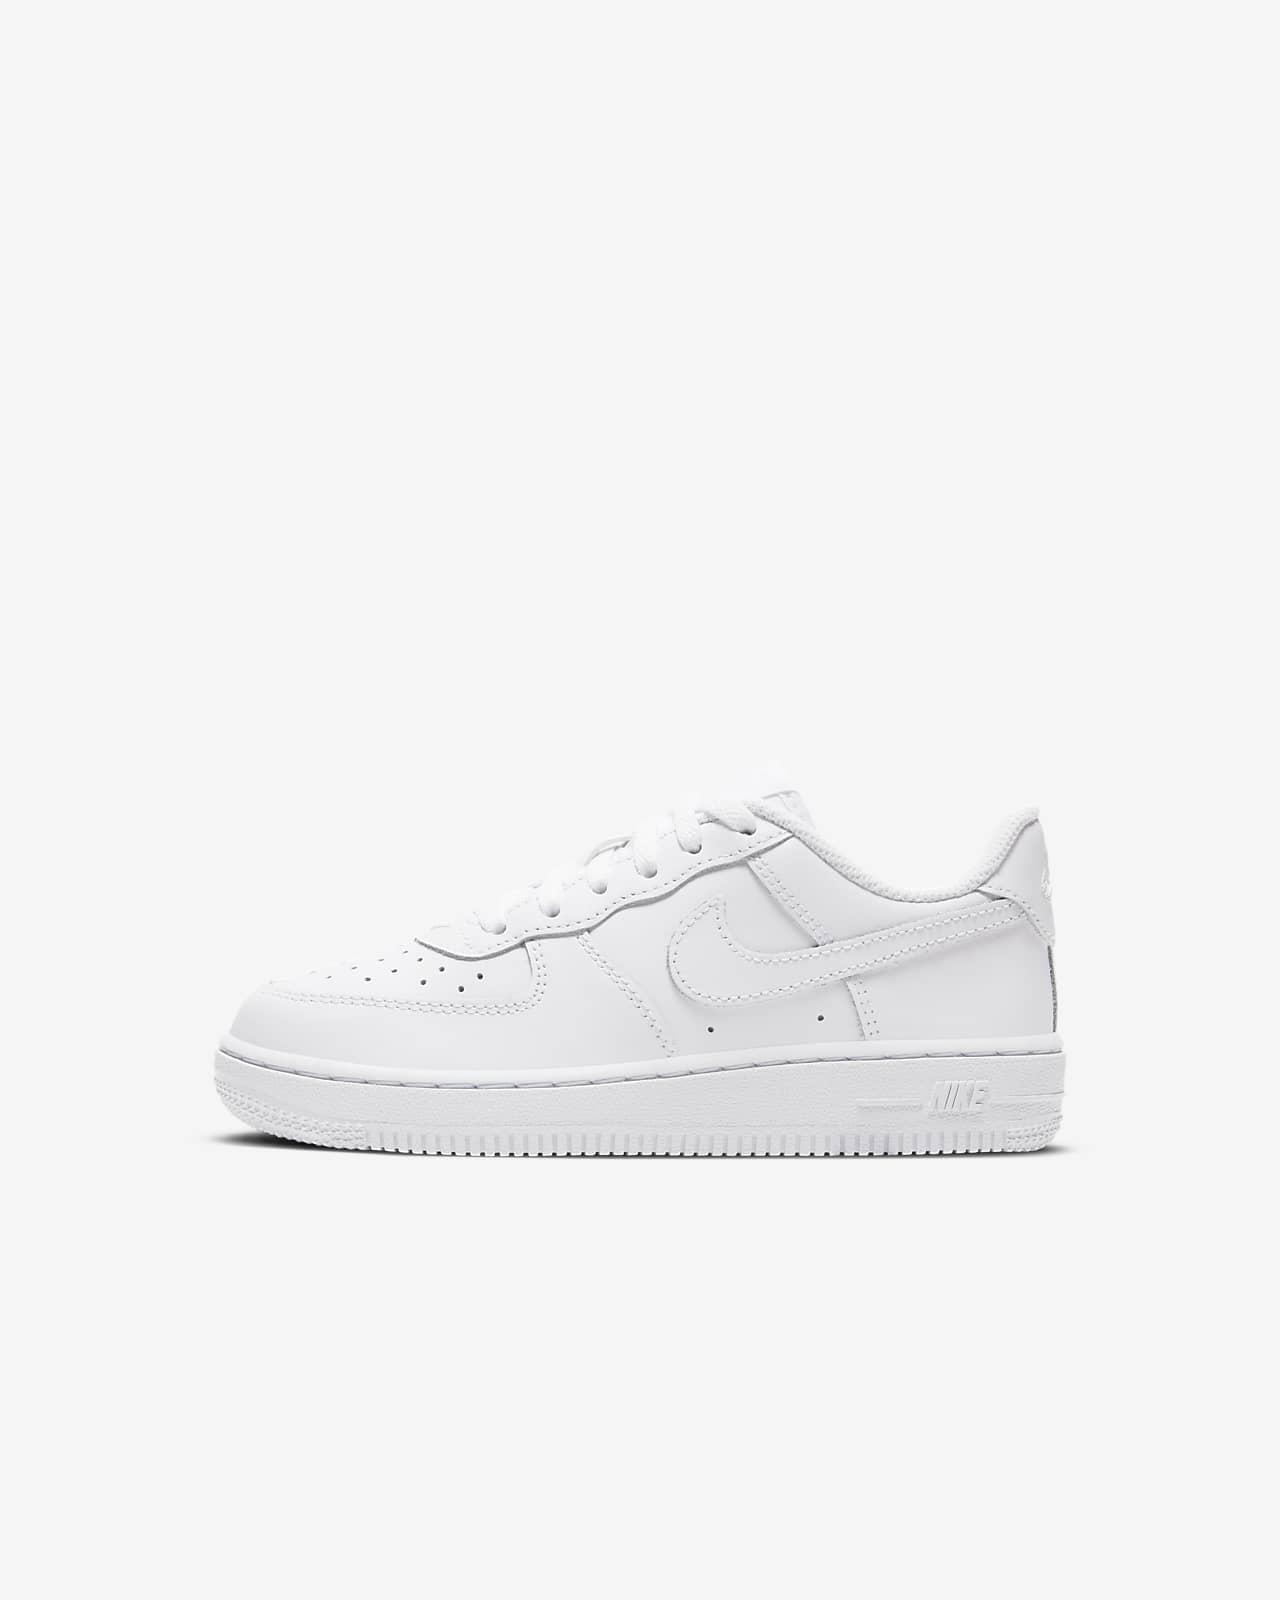 Nike Force 1 LE Little Kids' Shoes